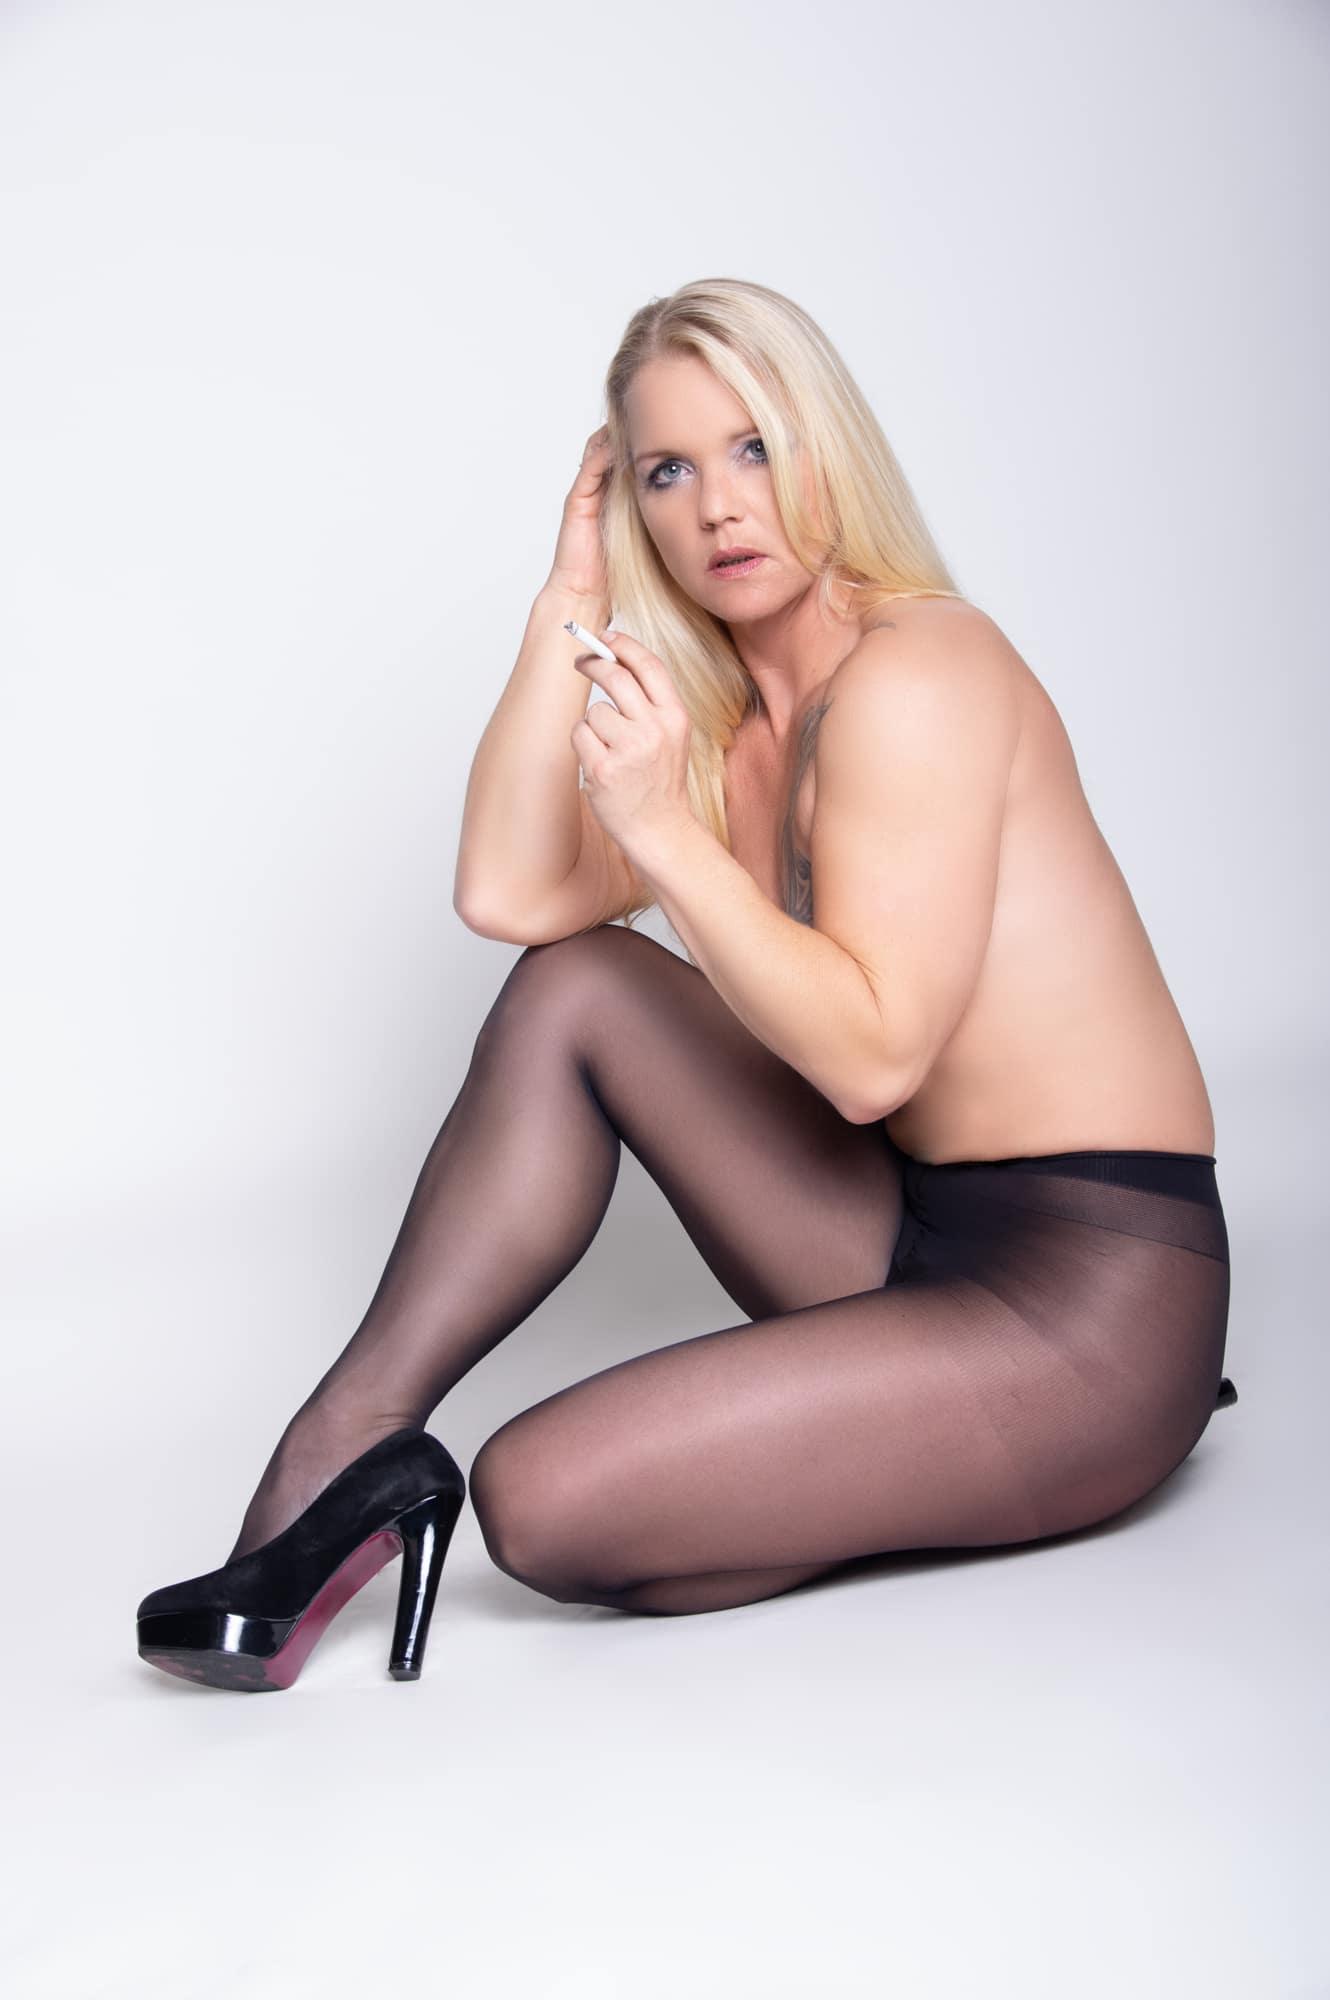 Best Ager Erotik Fotoshooting